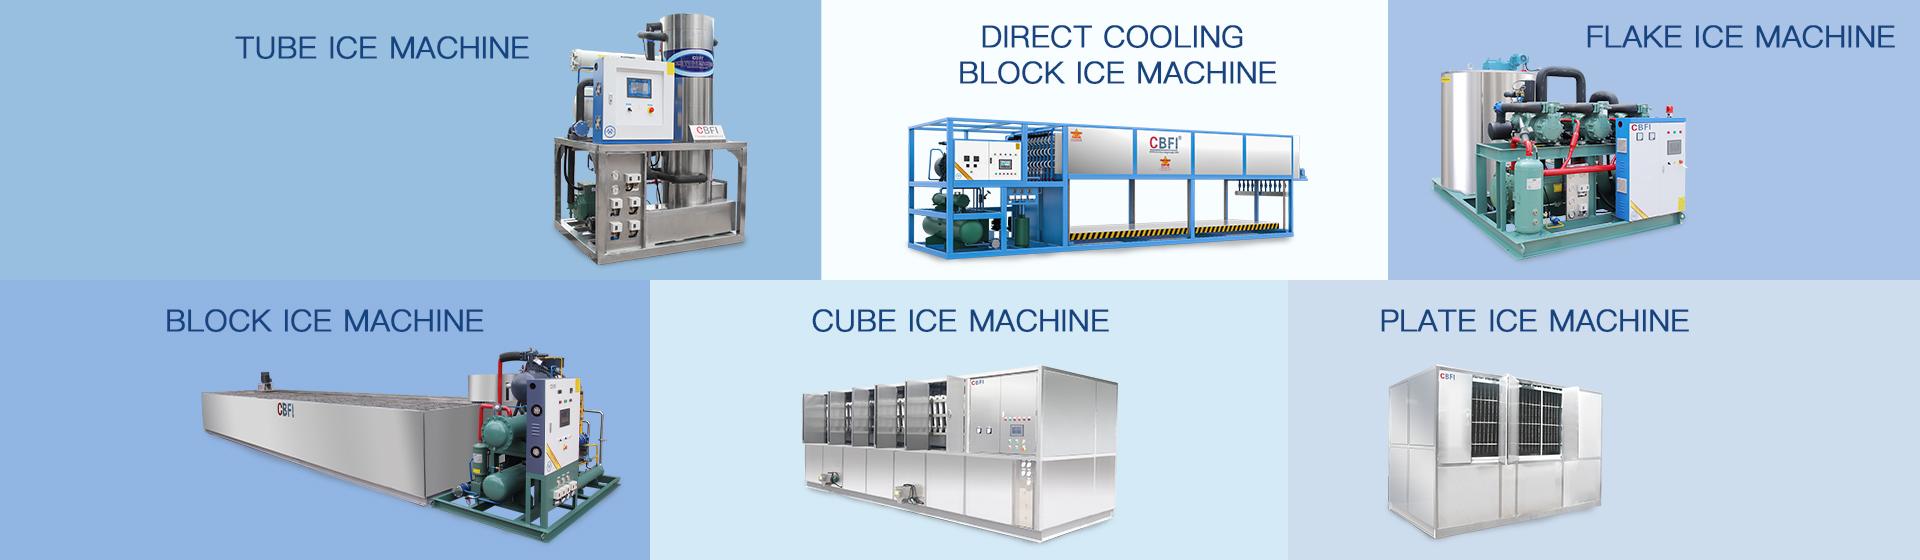 category-commercial ice machine-CBFI-img-5